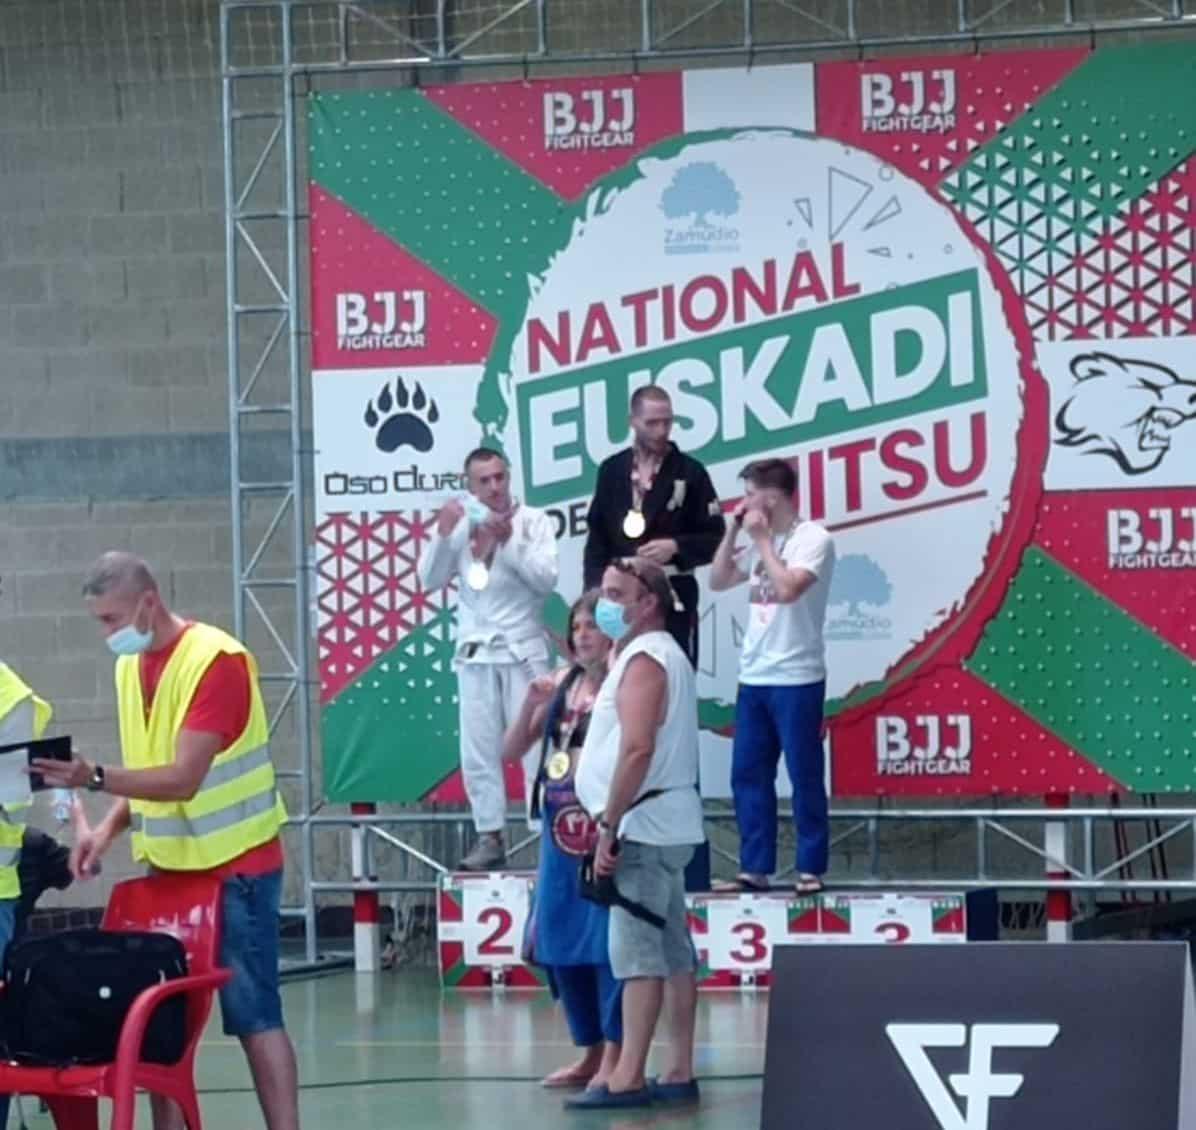 Gran papel del Haro Fight en el Campeonato de Euskadi de Jiu-jitsu 2